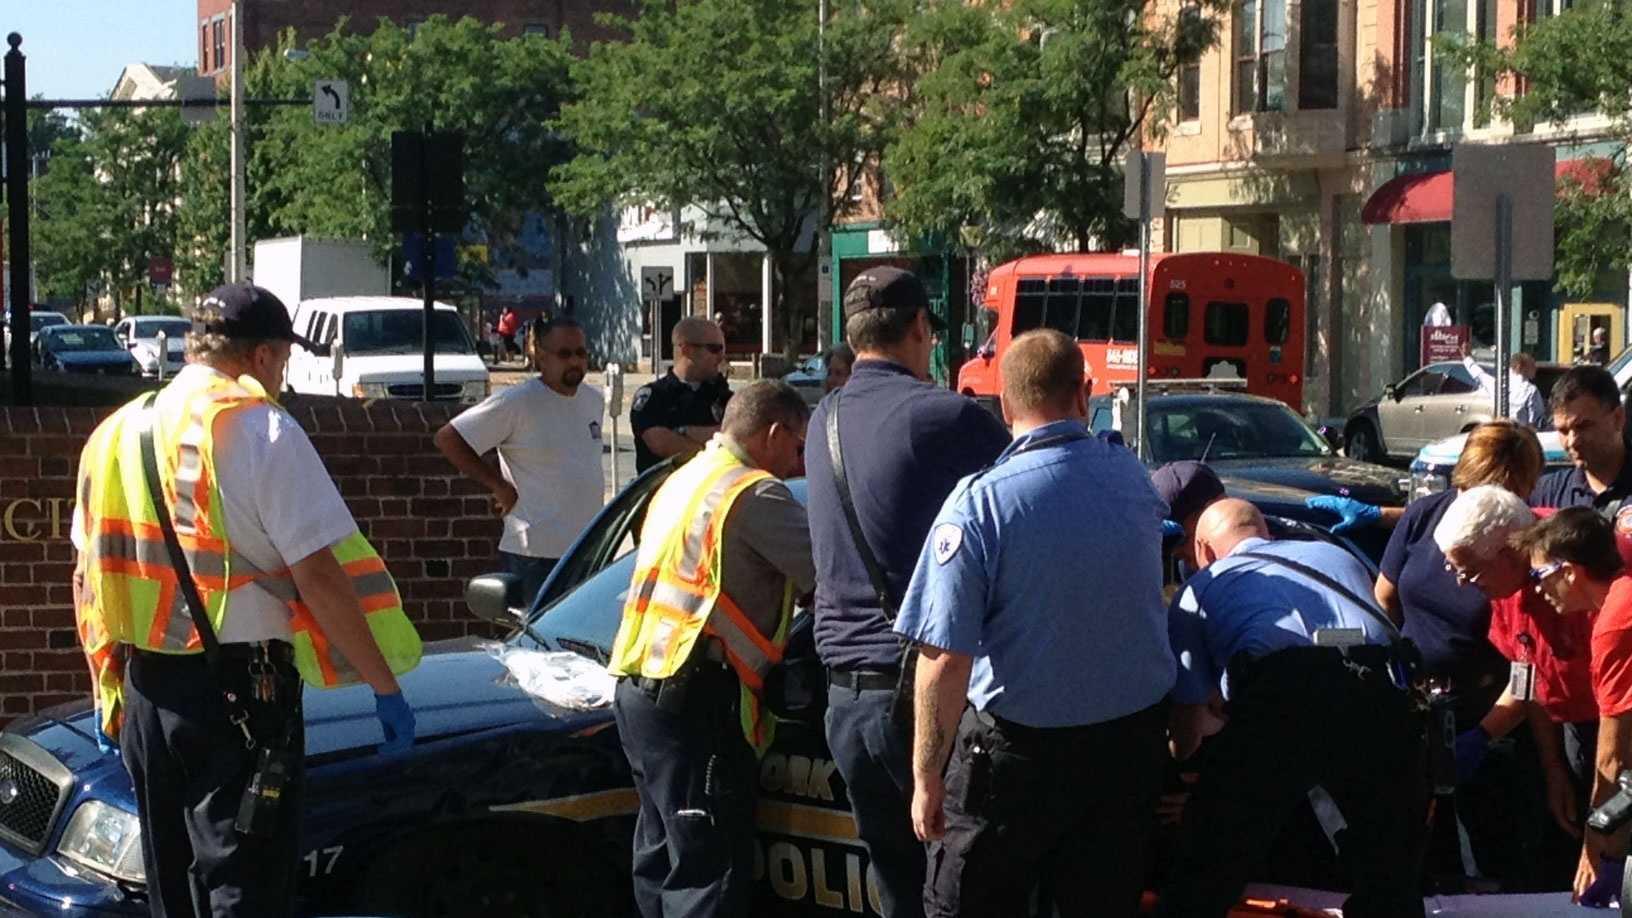 Police crash photo